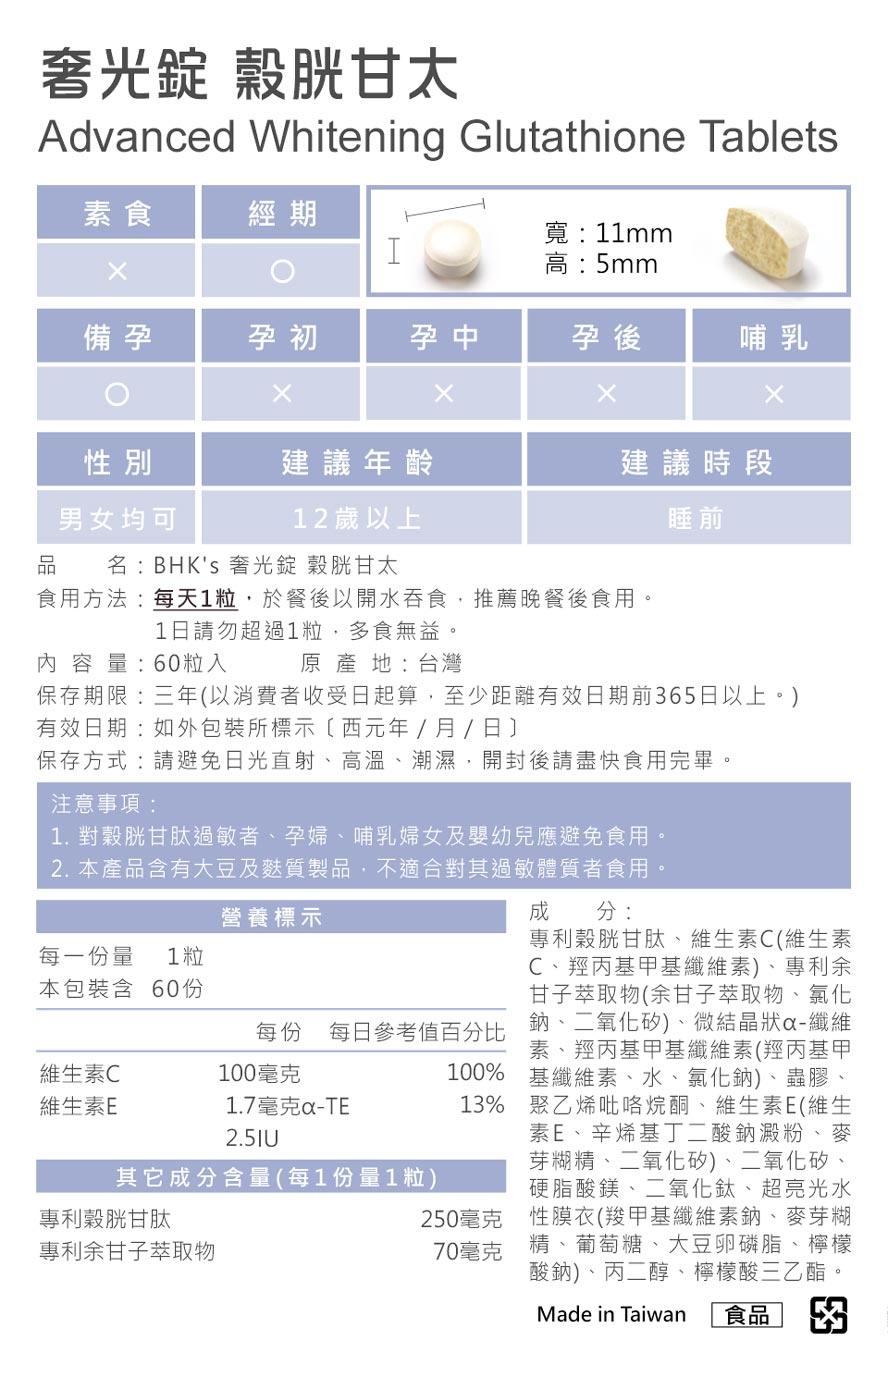 BHK's奢光锭采用日本专利谷胱甘肽,250mg足量,深释肠溶技术强化吸收